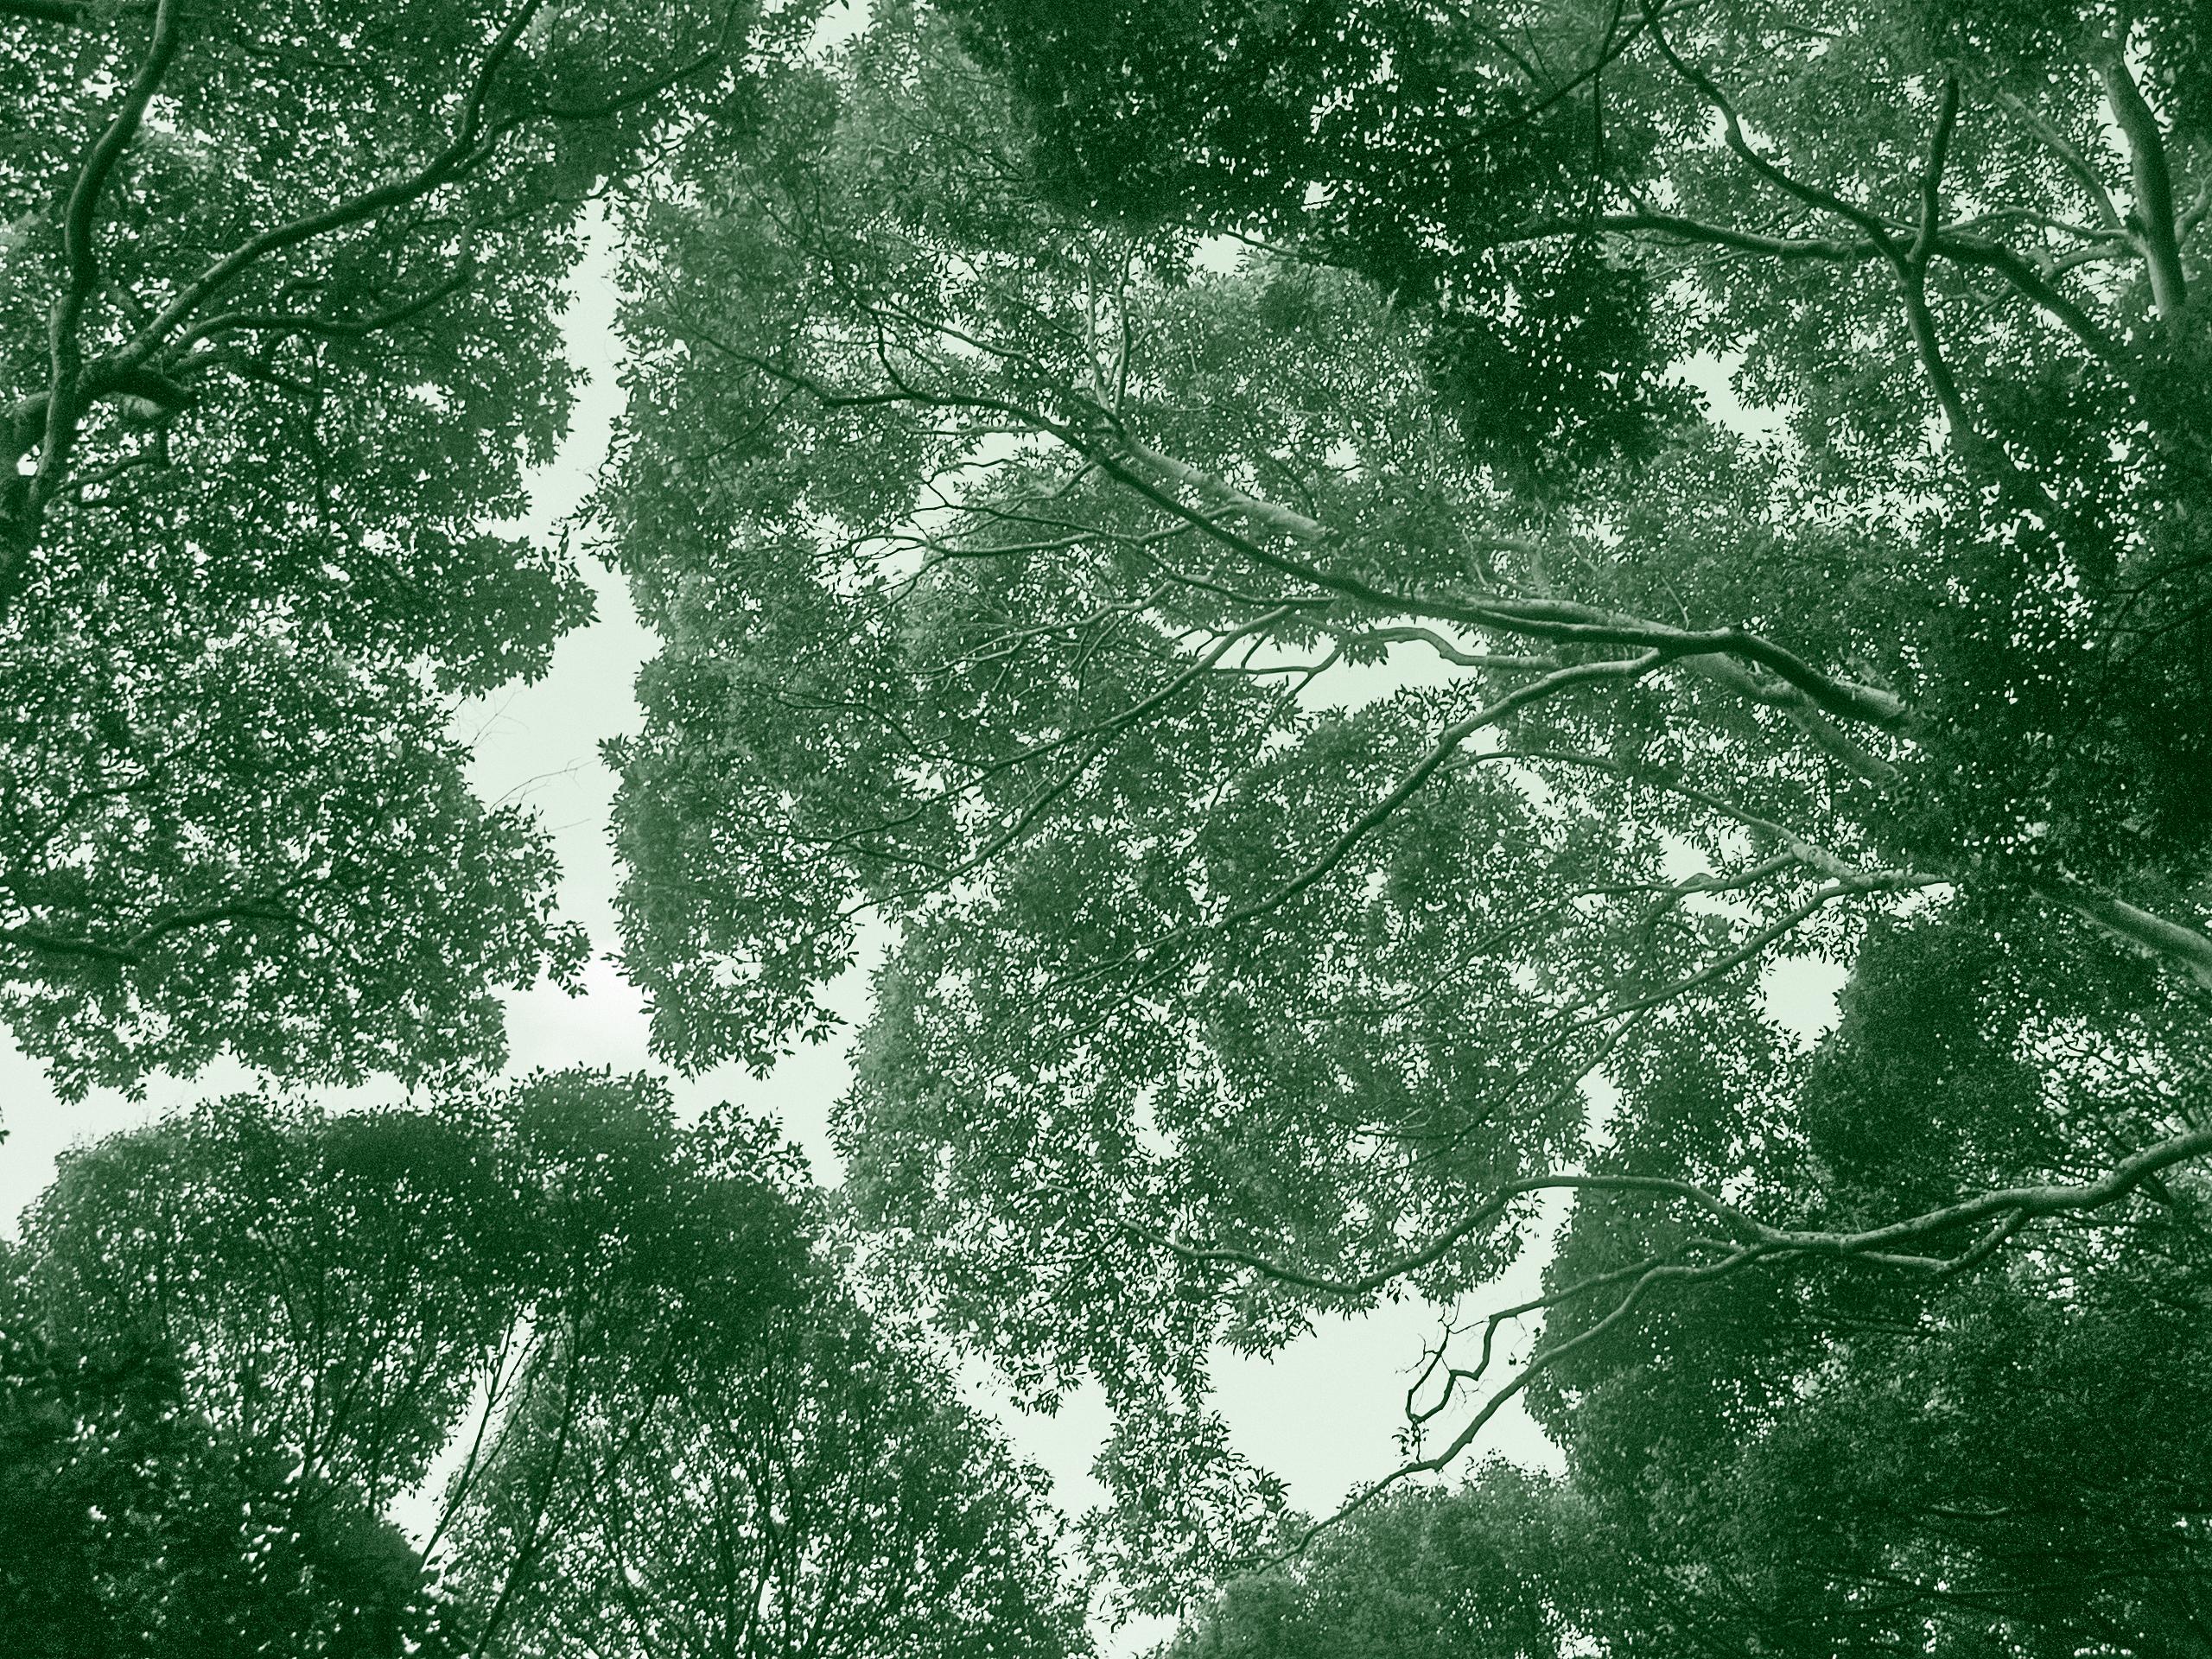 Tropical jungle ecosystem